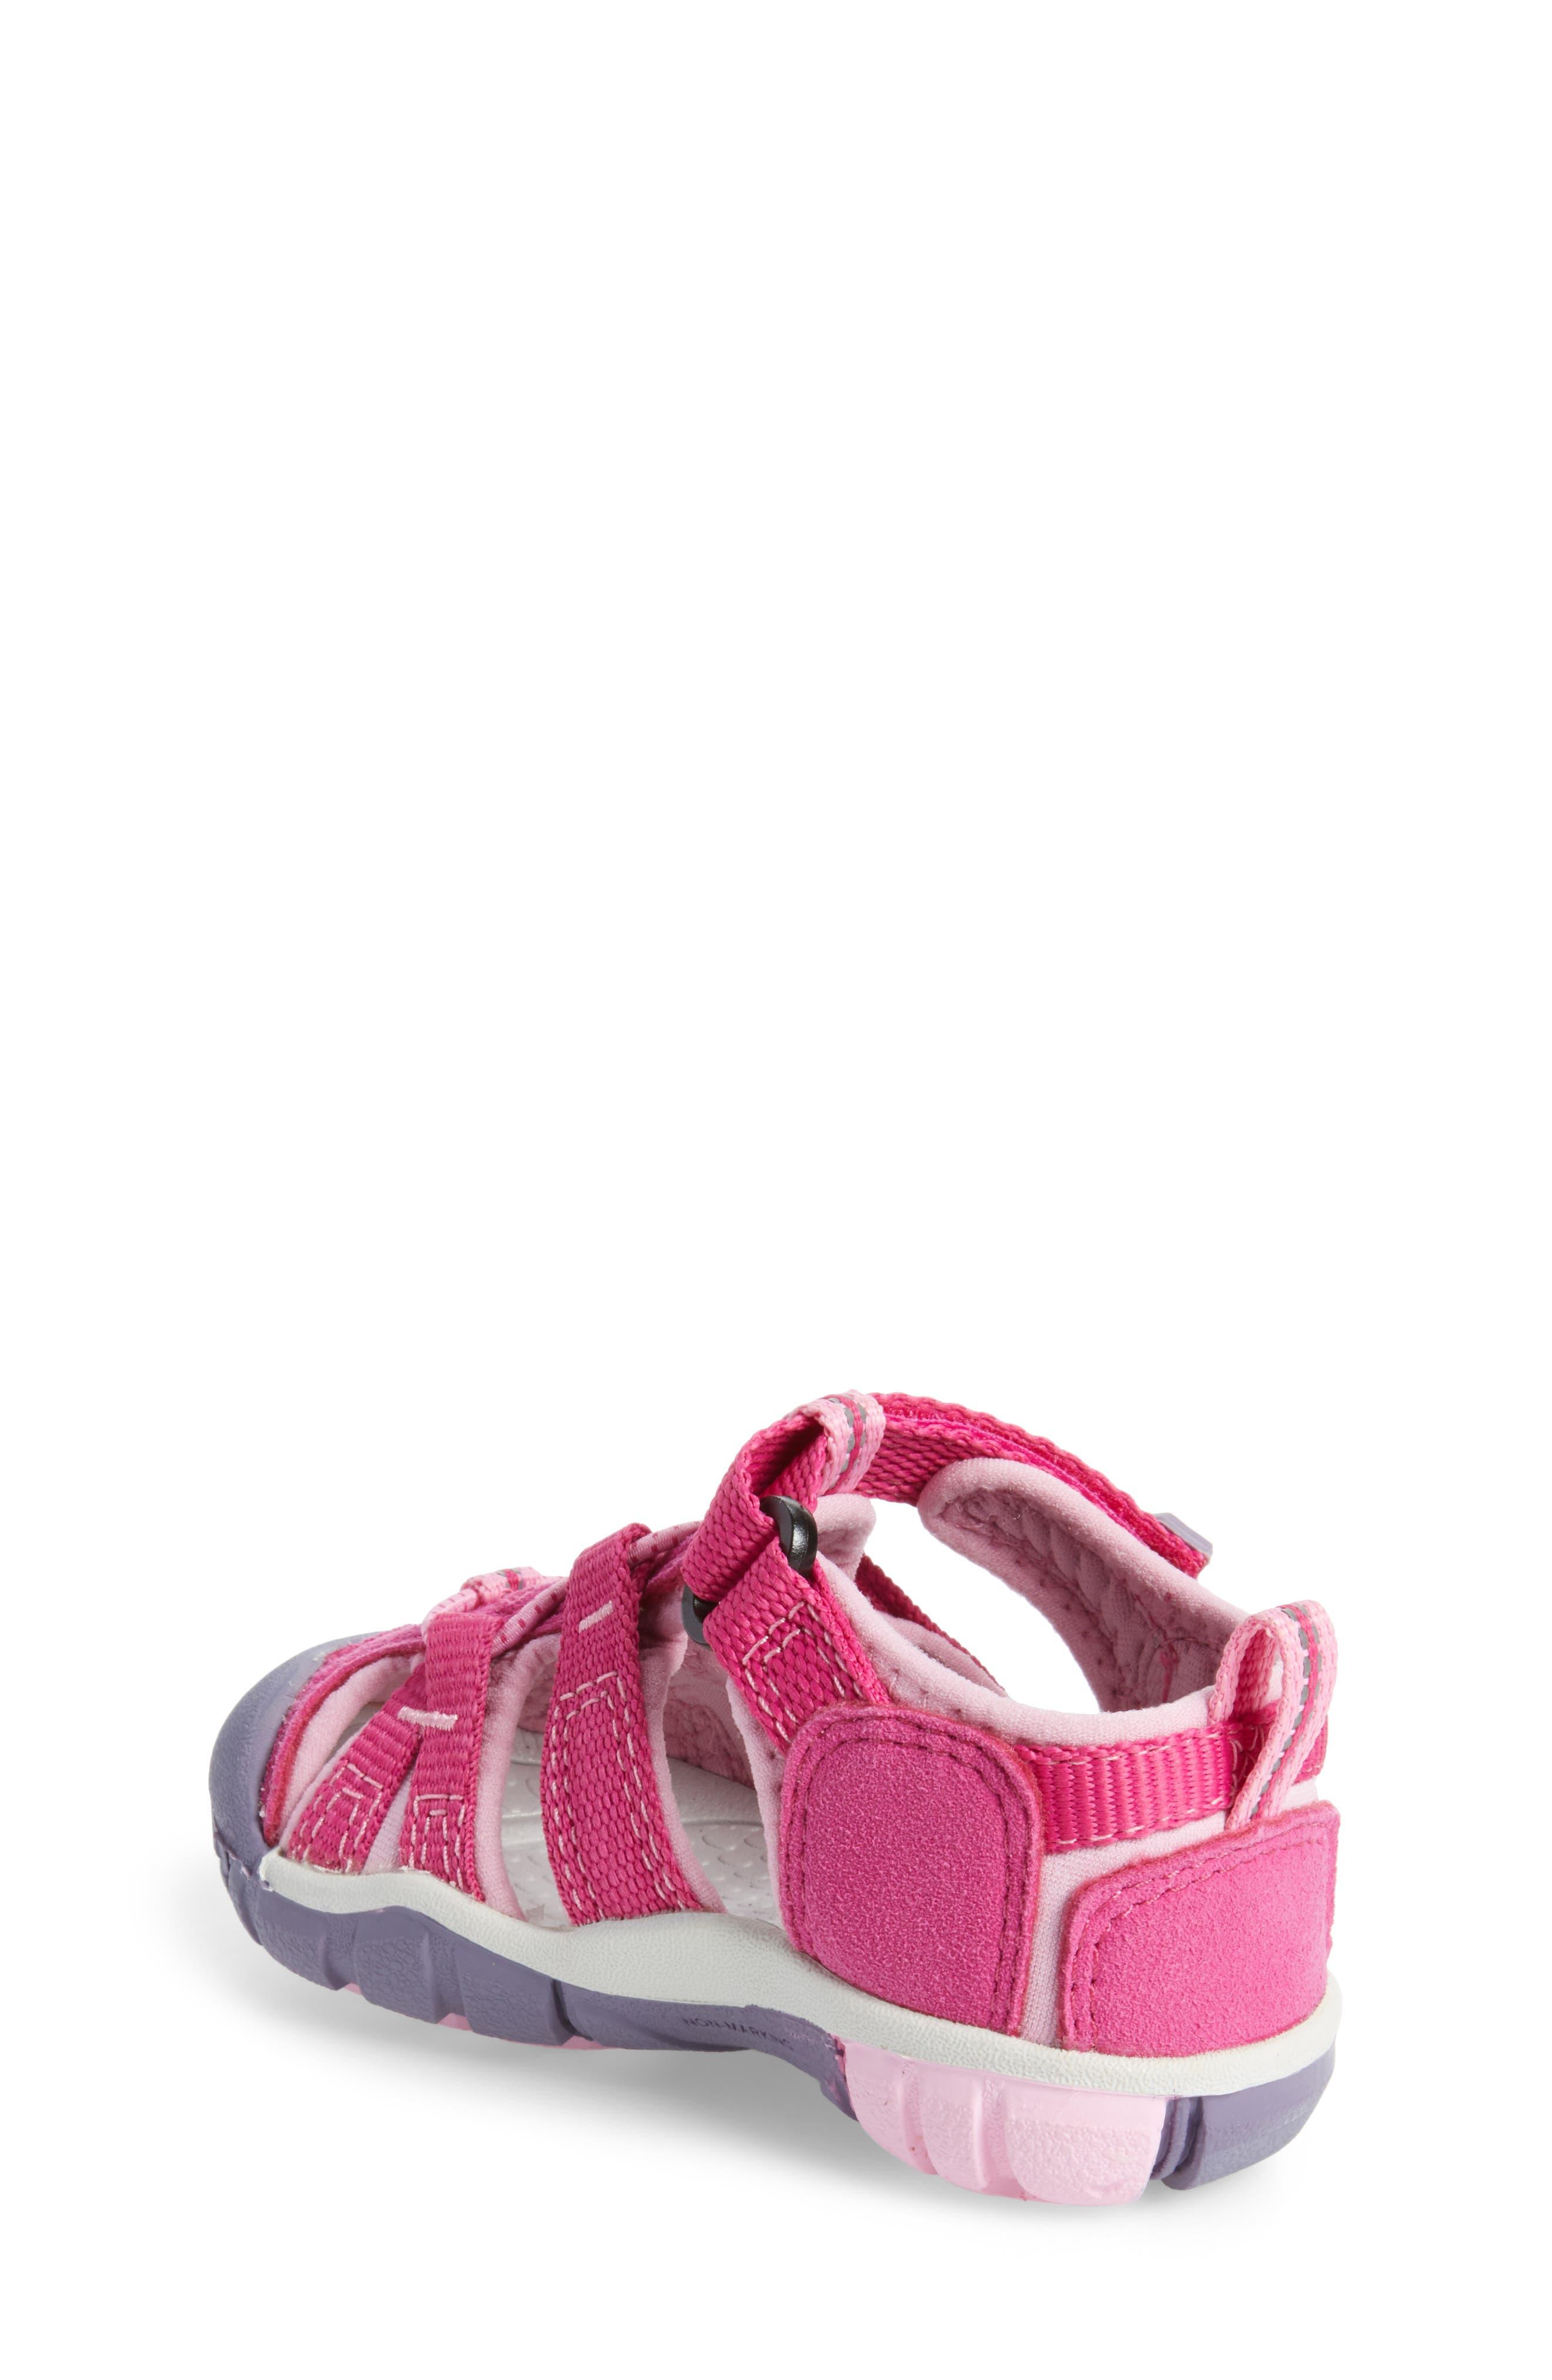 'Seacamp II' Water Friendly Sandal,                             Alternate thumbnail 2, color,                             Very Berry/ Lilac Chiffon